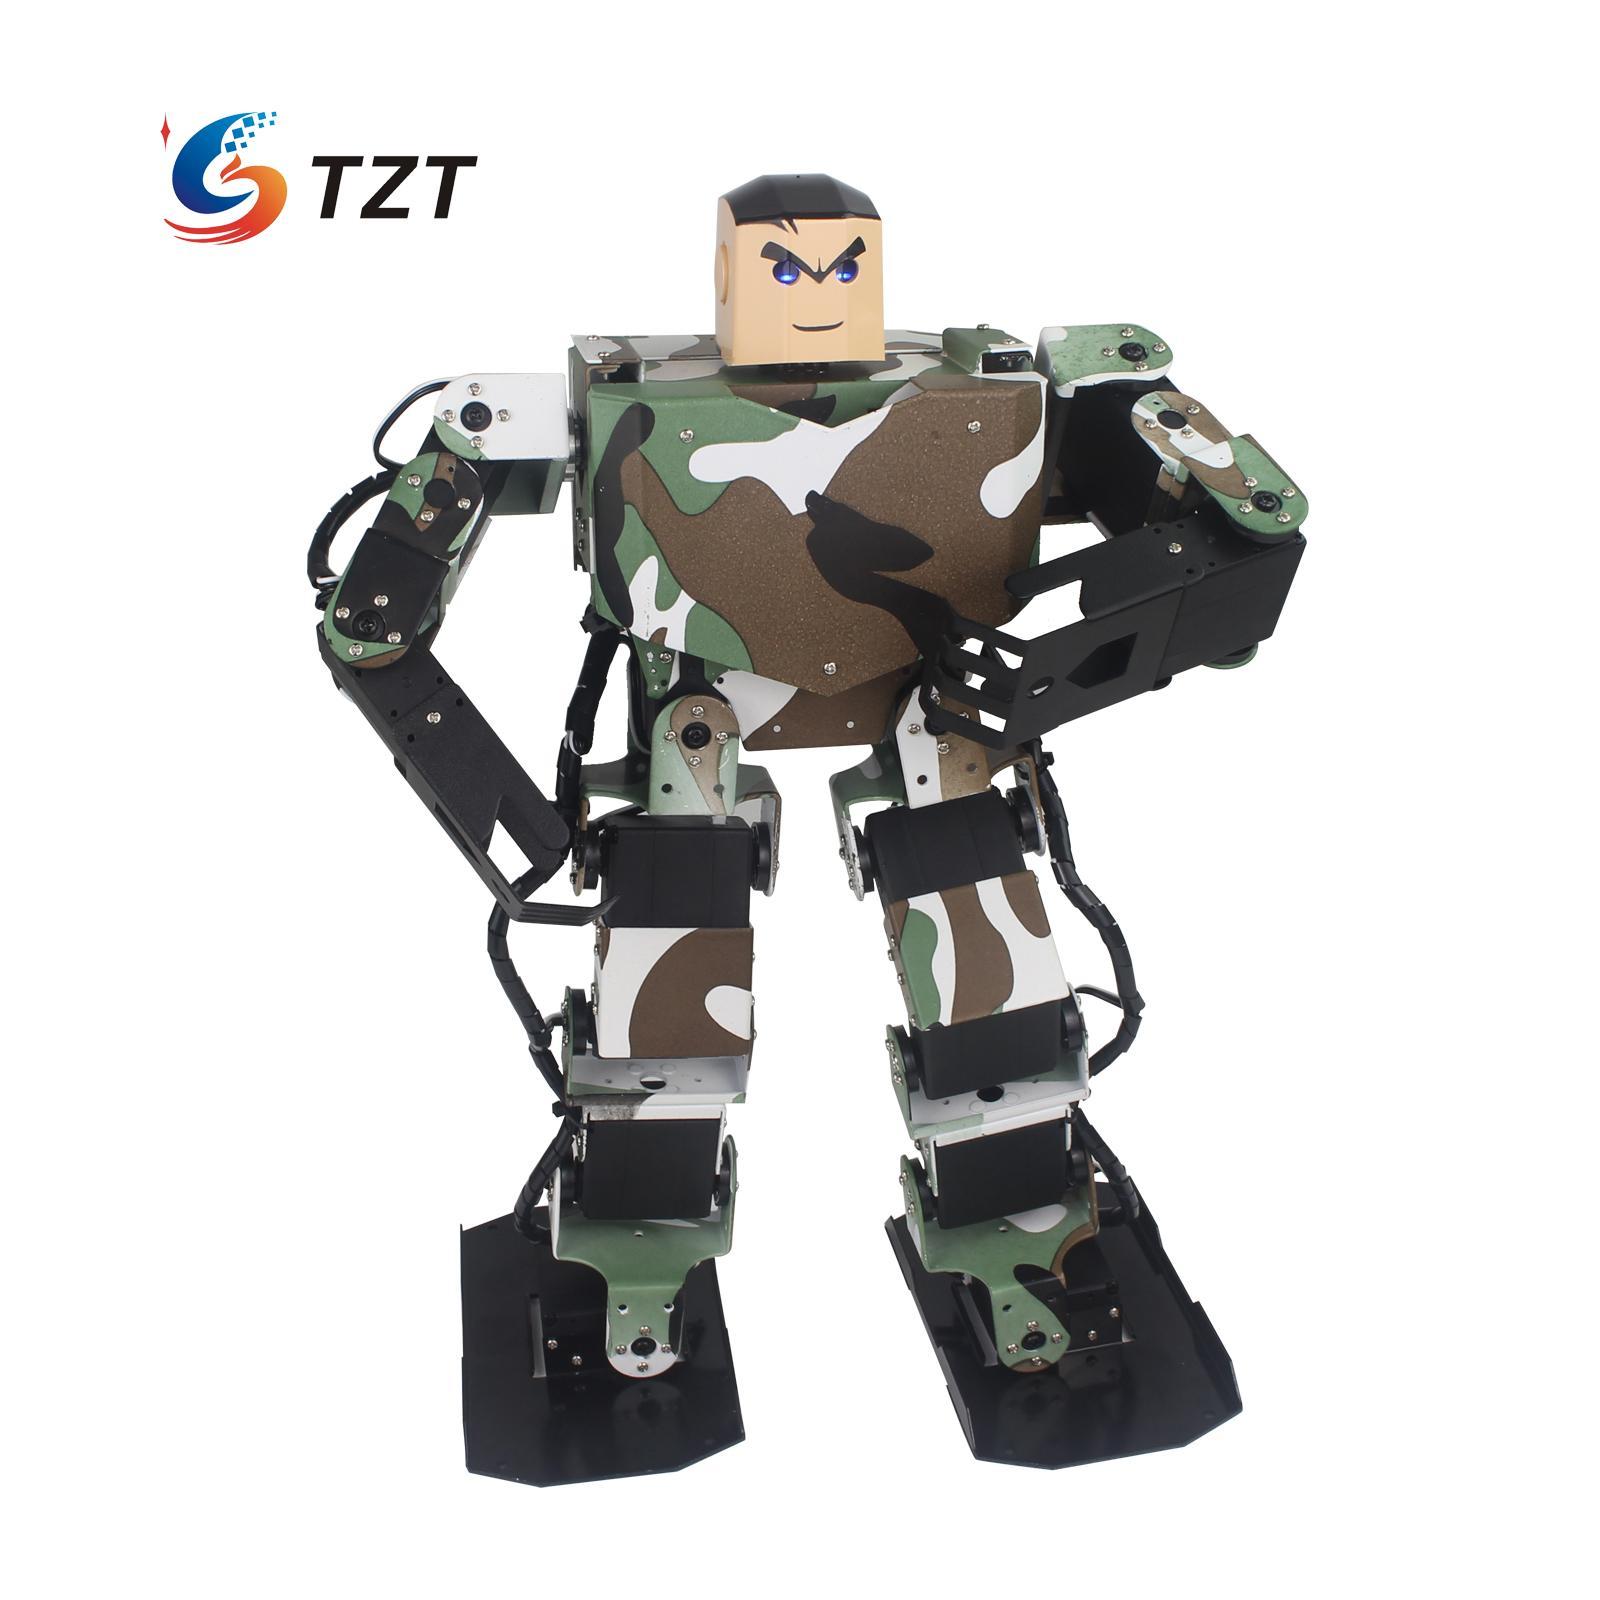 Soldier King 16DOF Smart Humanoid Robot Frame Kits Contest Dance Biped Robotics for DIY Unassembled soldier king 16dof smart humanoid robot frame contest dance biped robotics for diy